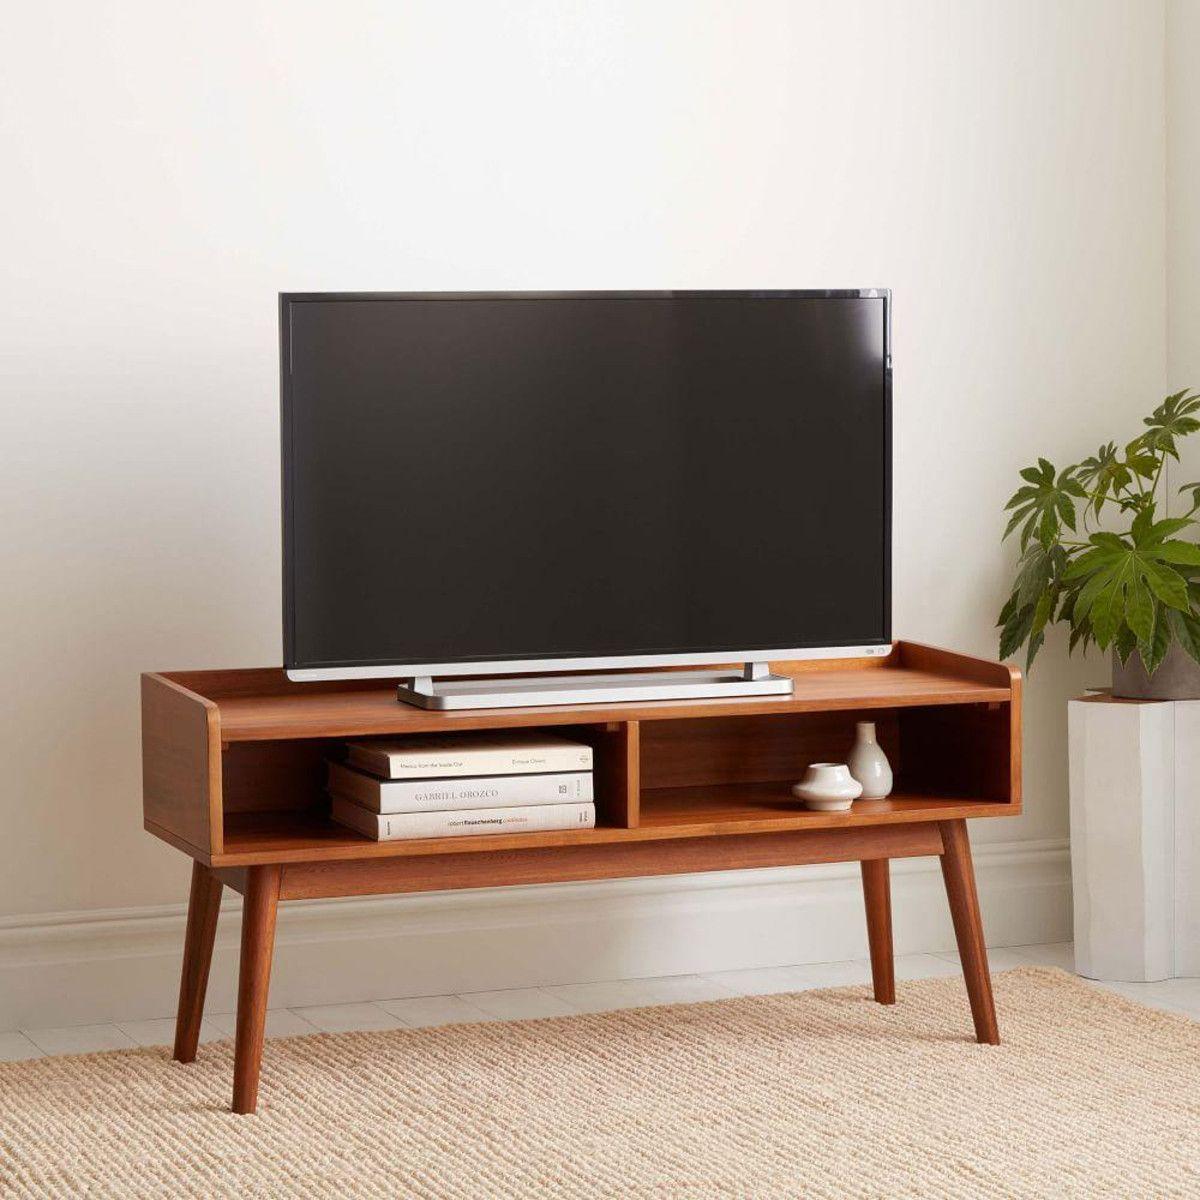 Modern Furniture, Home Decor U0026 Home Accessories | West Elm